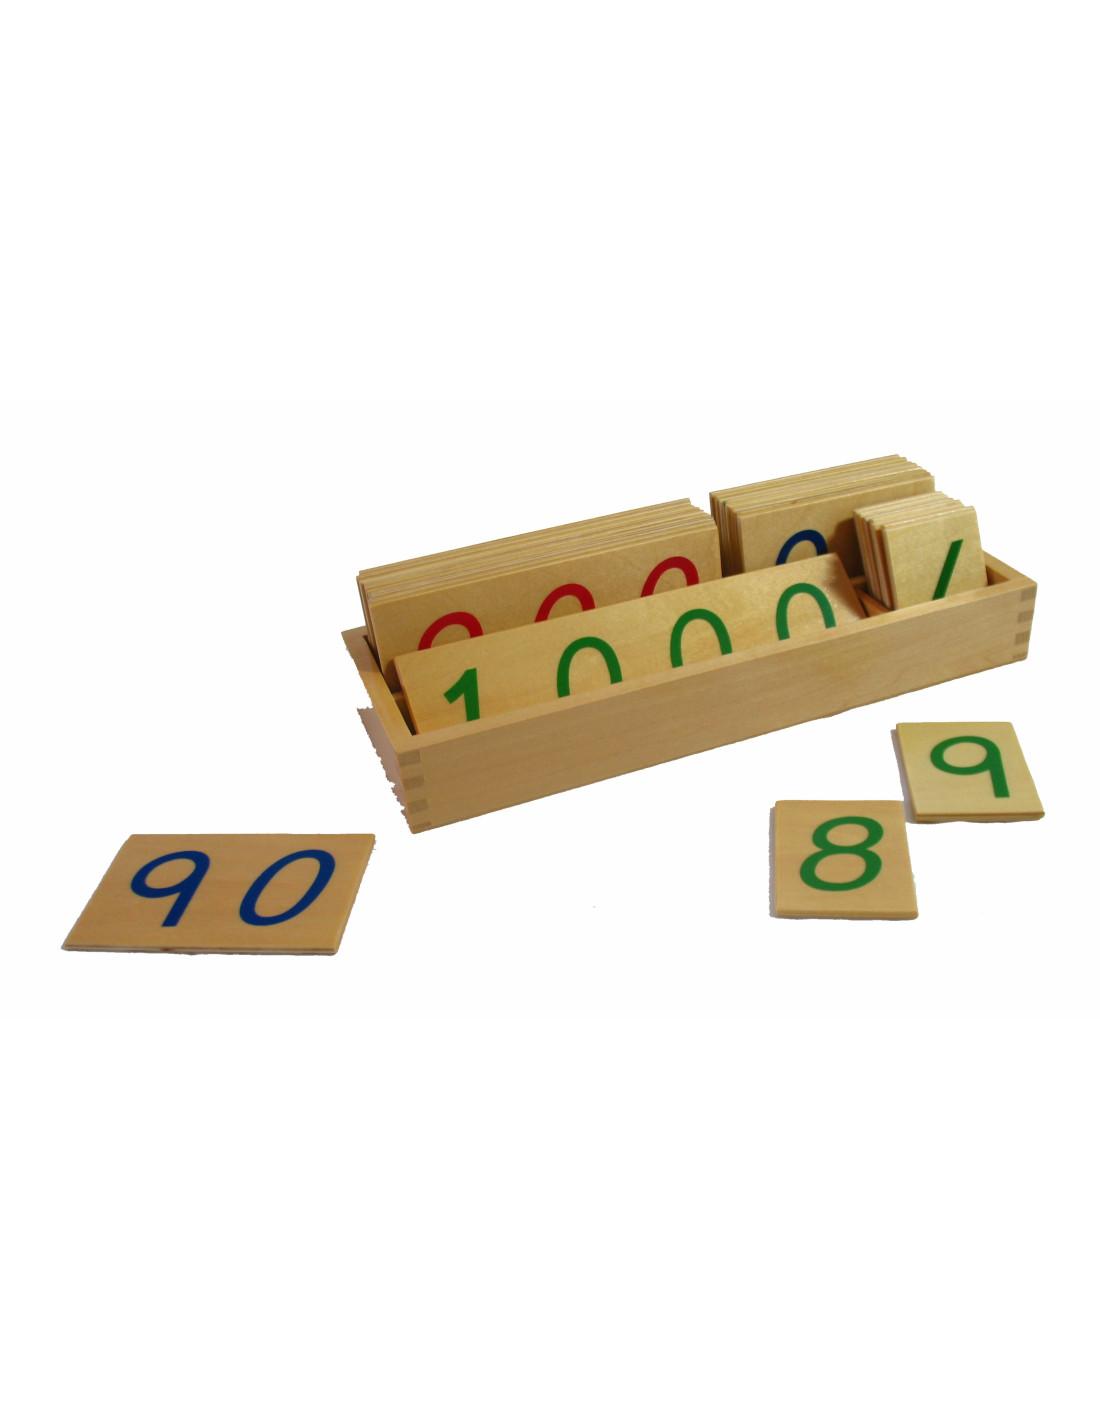 карточки с картинками по системе монтессори хвостики